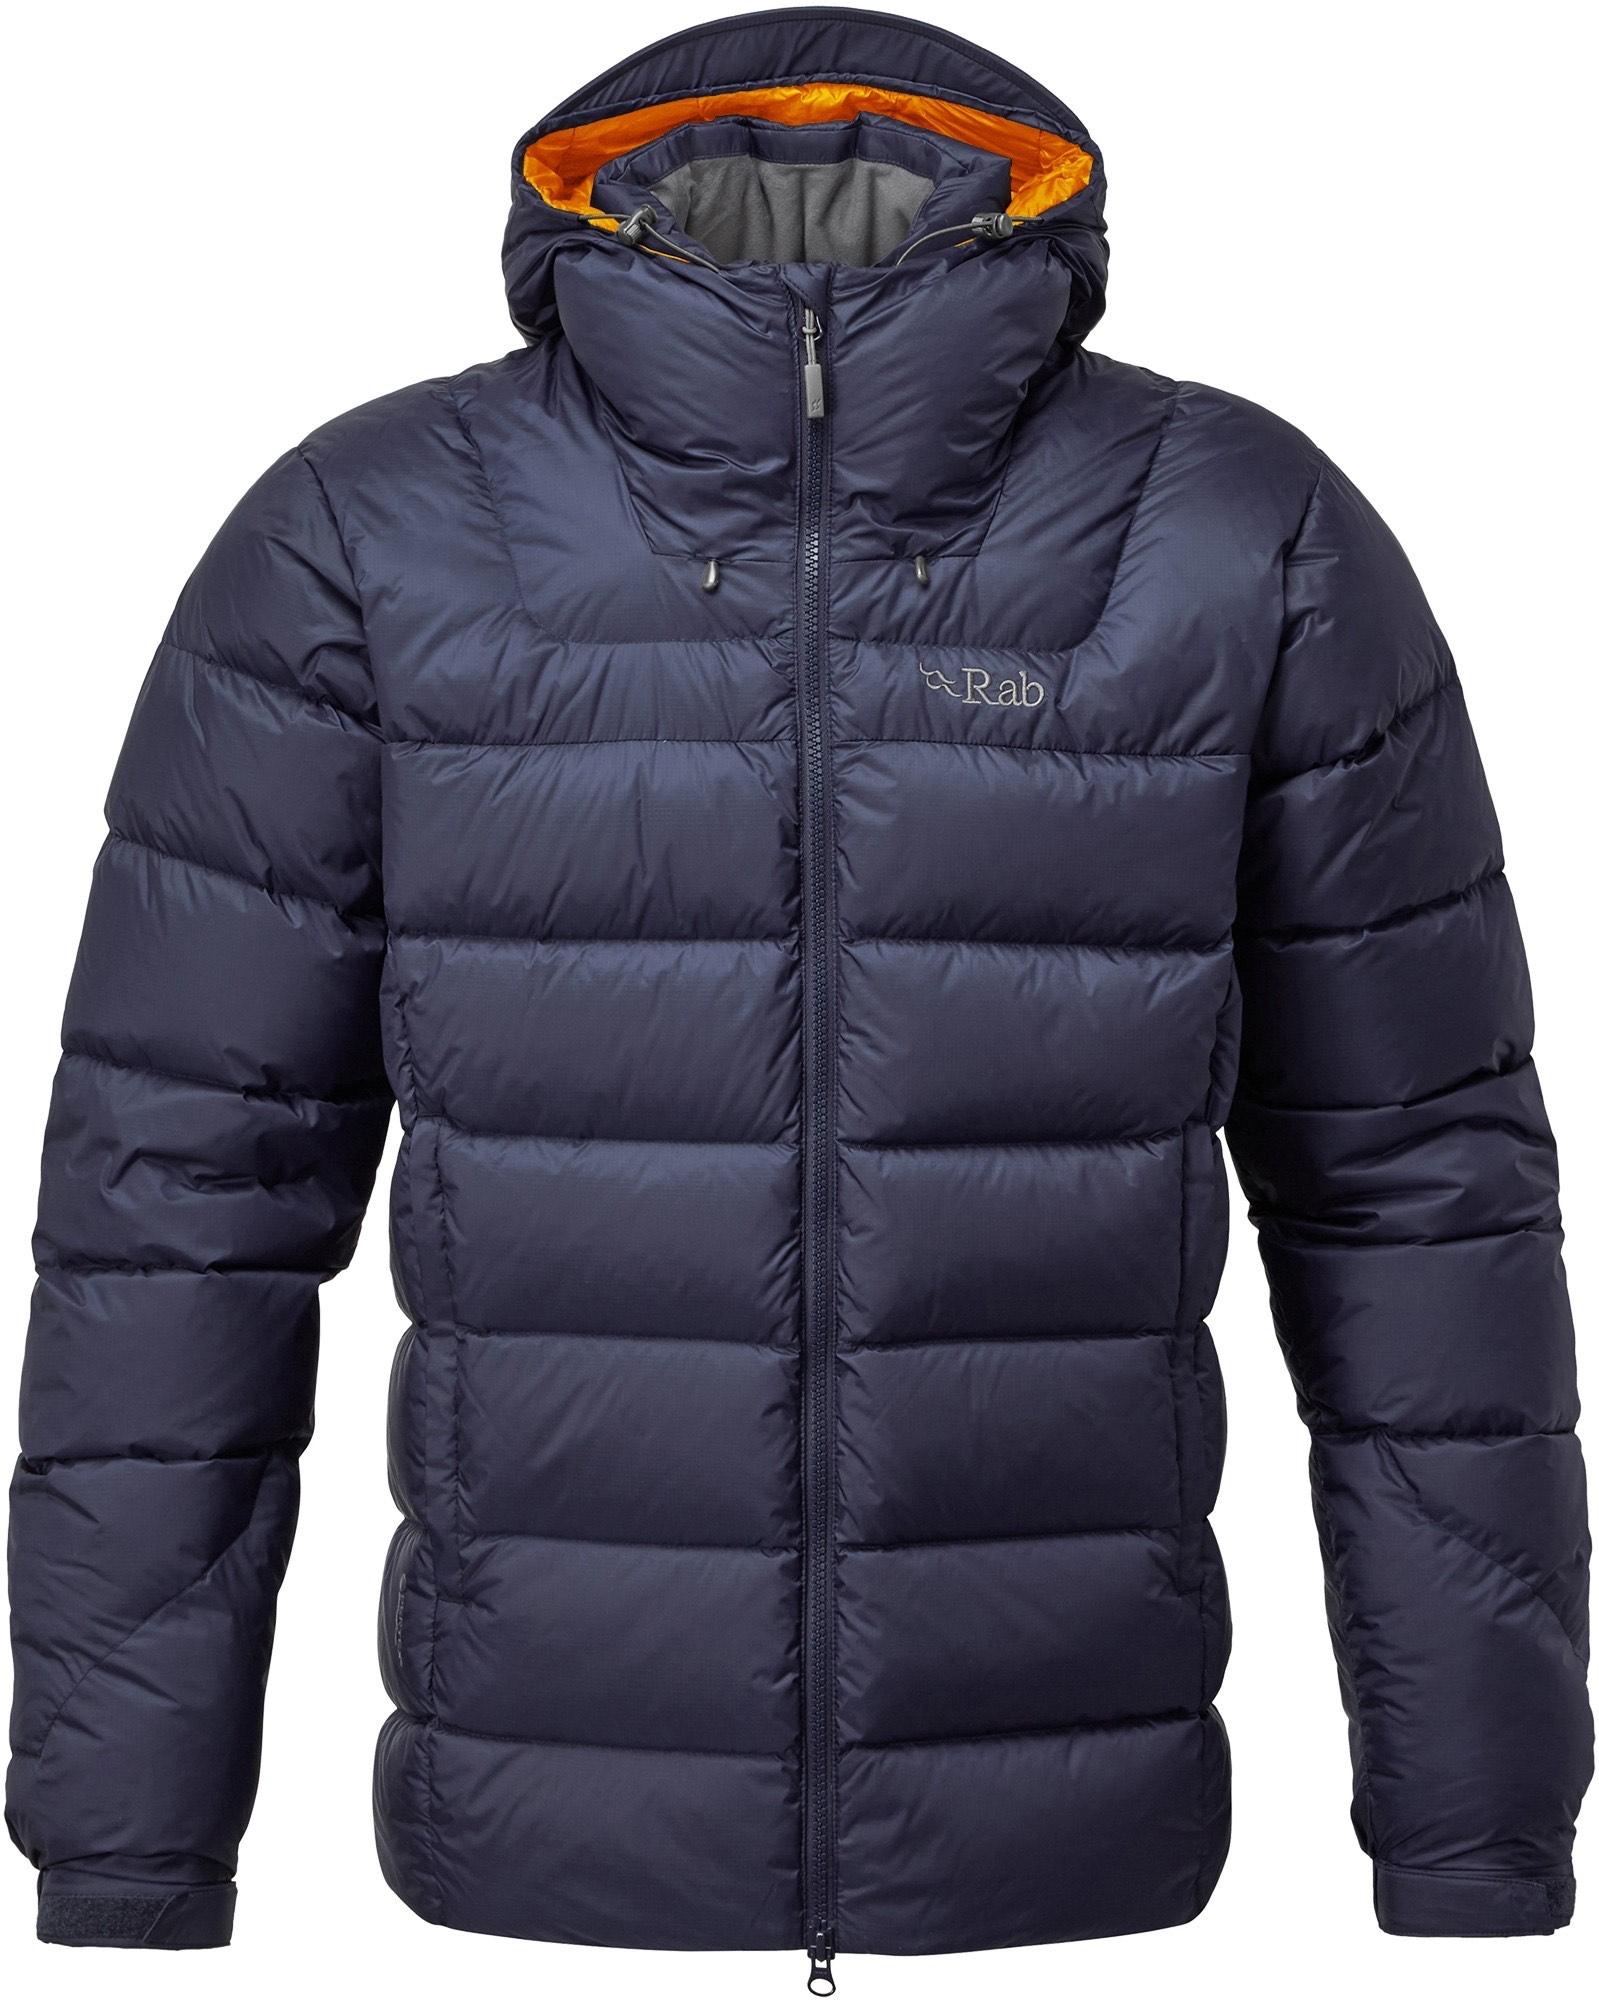 Rab Axion Down Jacket Mens £135 @ Taunton Leisure